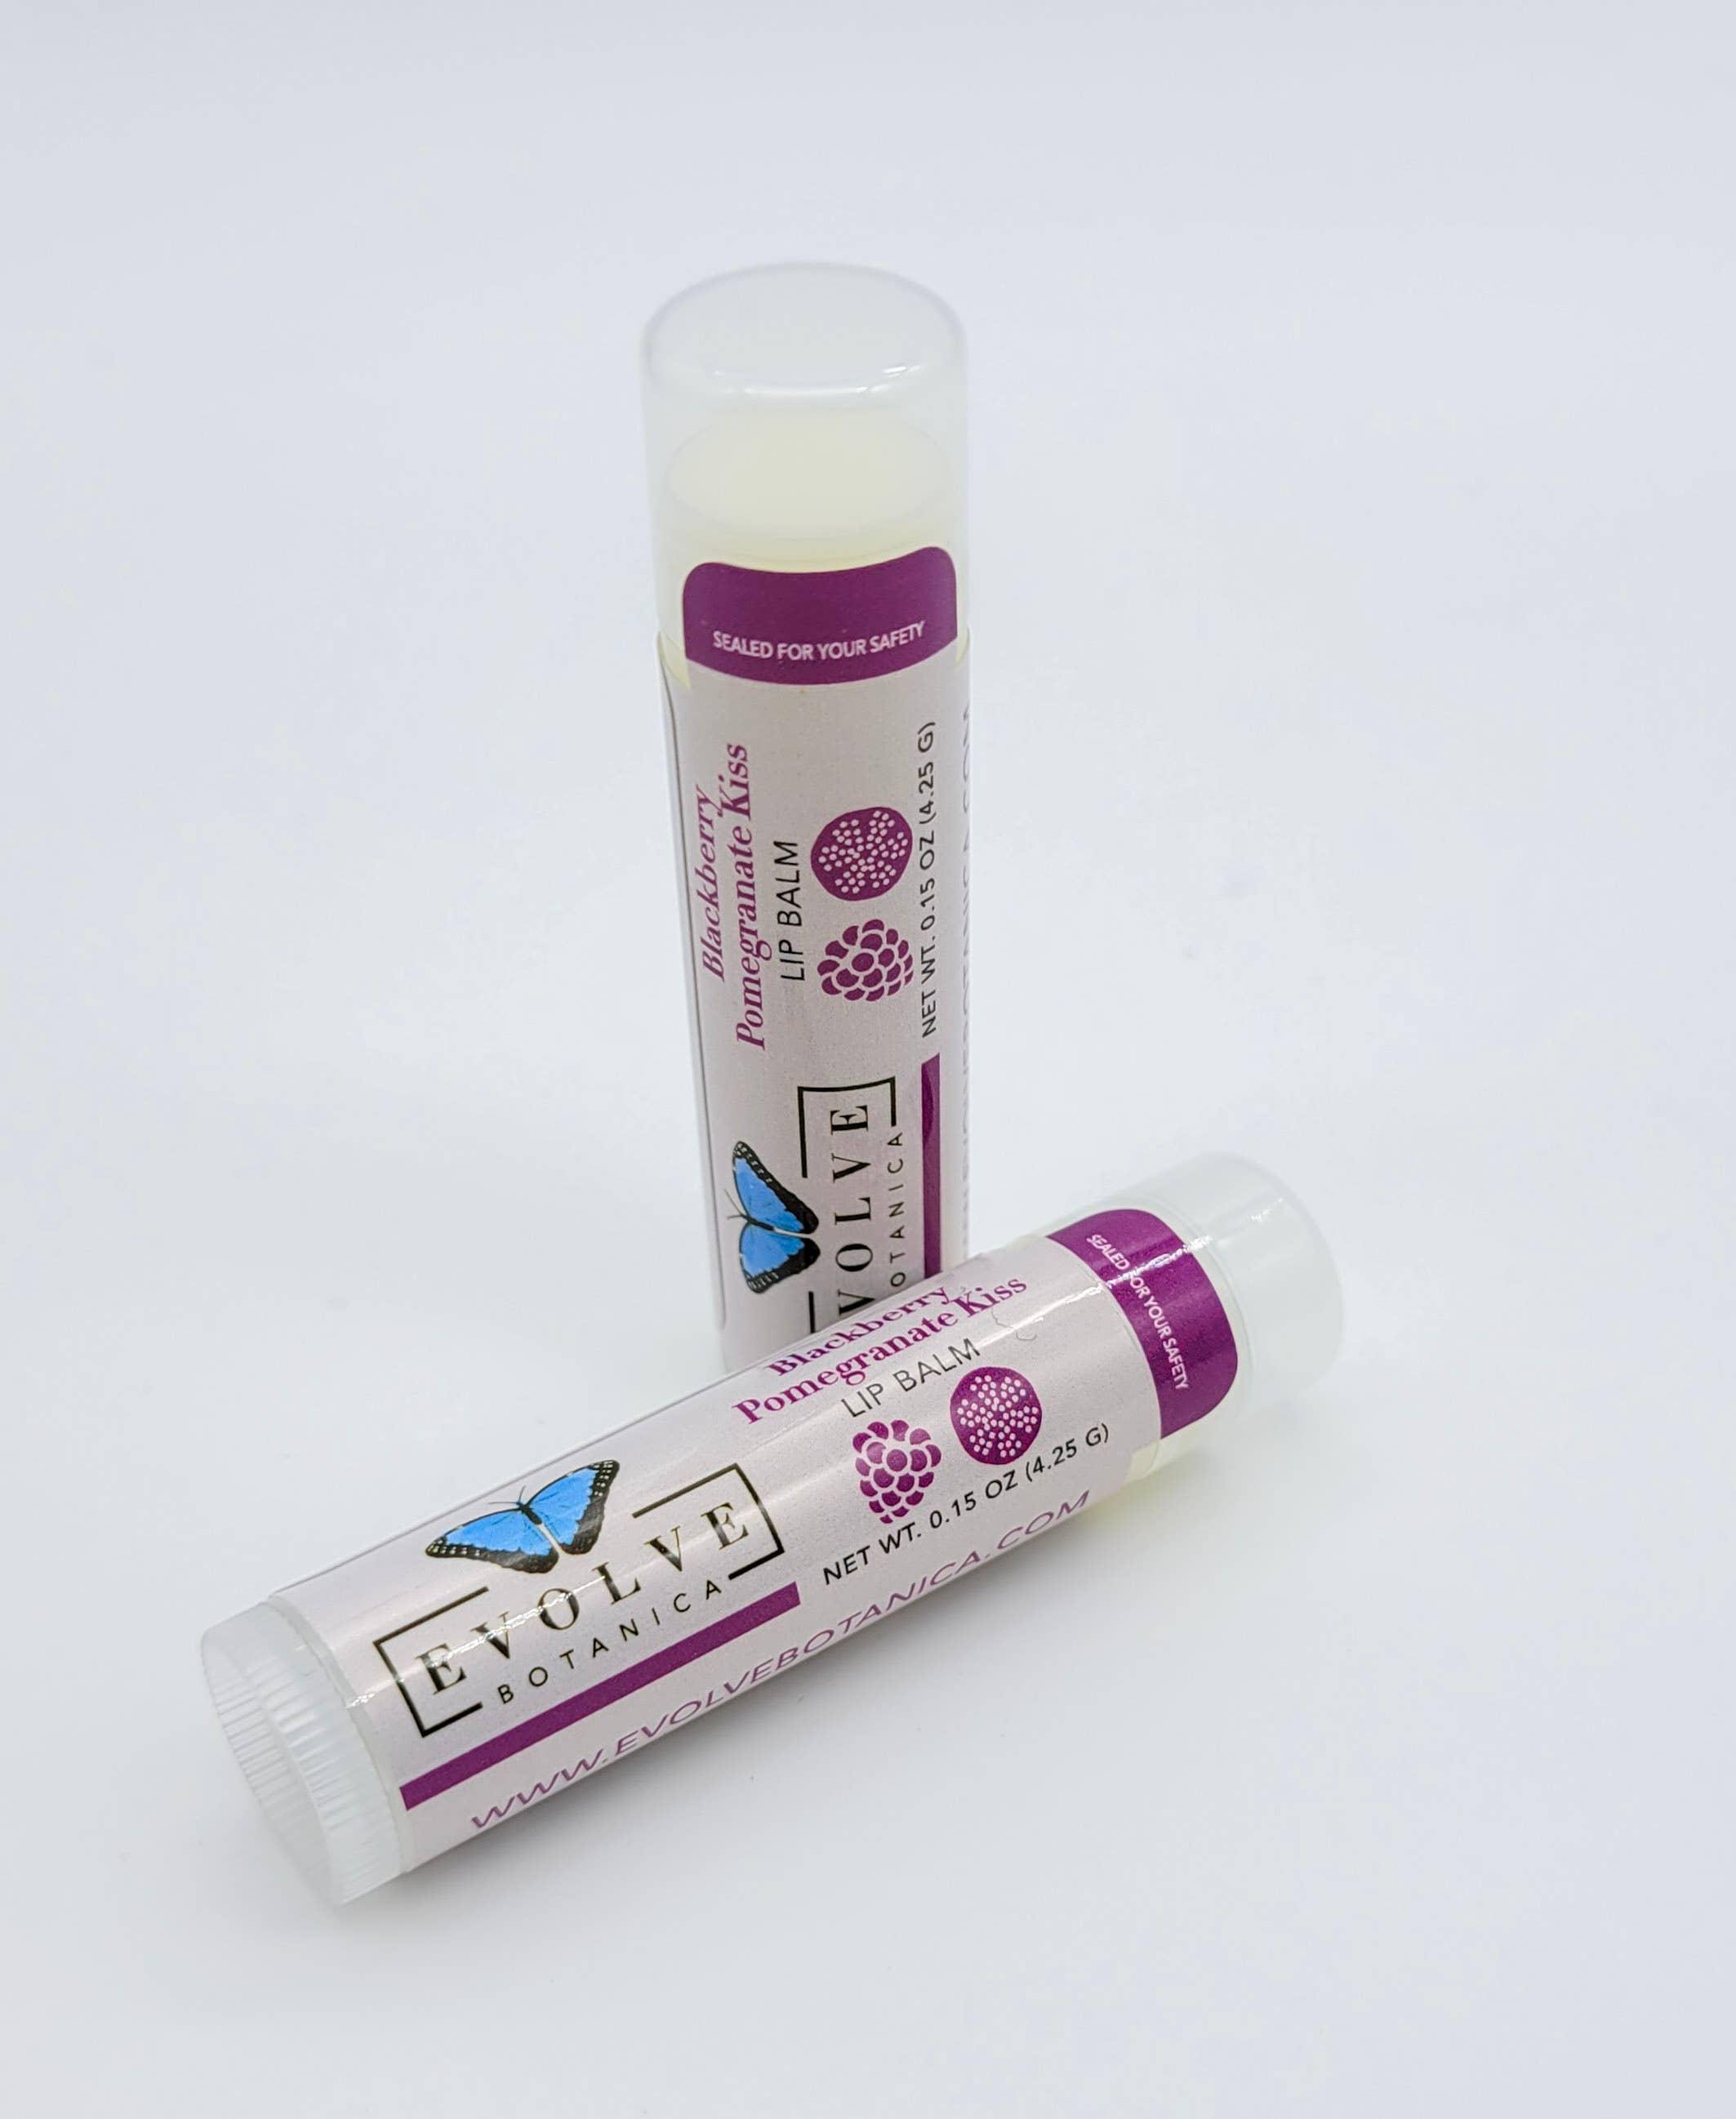 Evolve - Lip Balm - Blackberry Pomegranate | Trada Marketplace